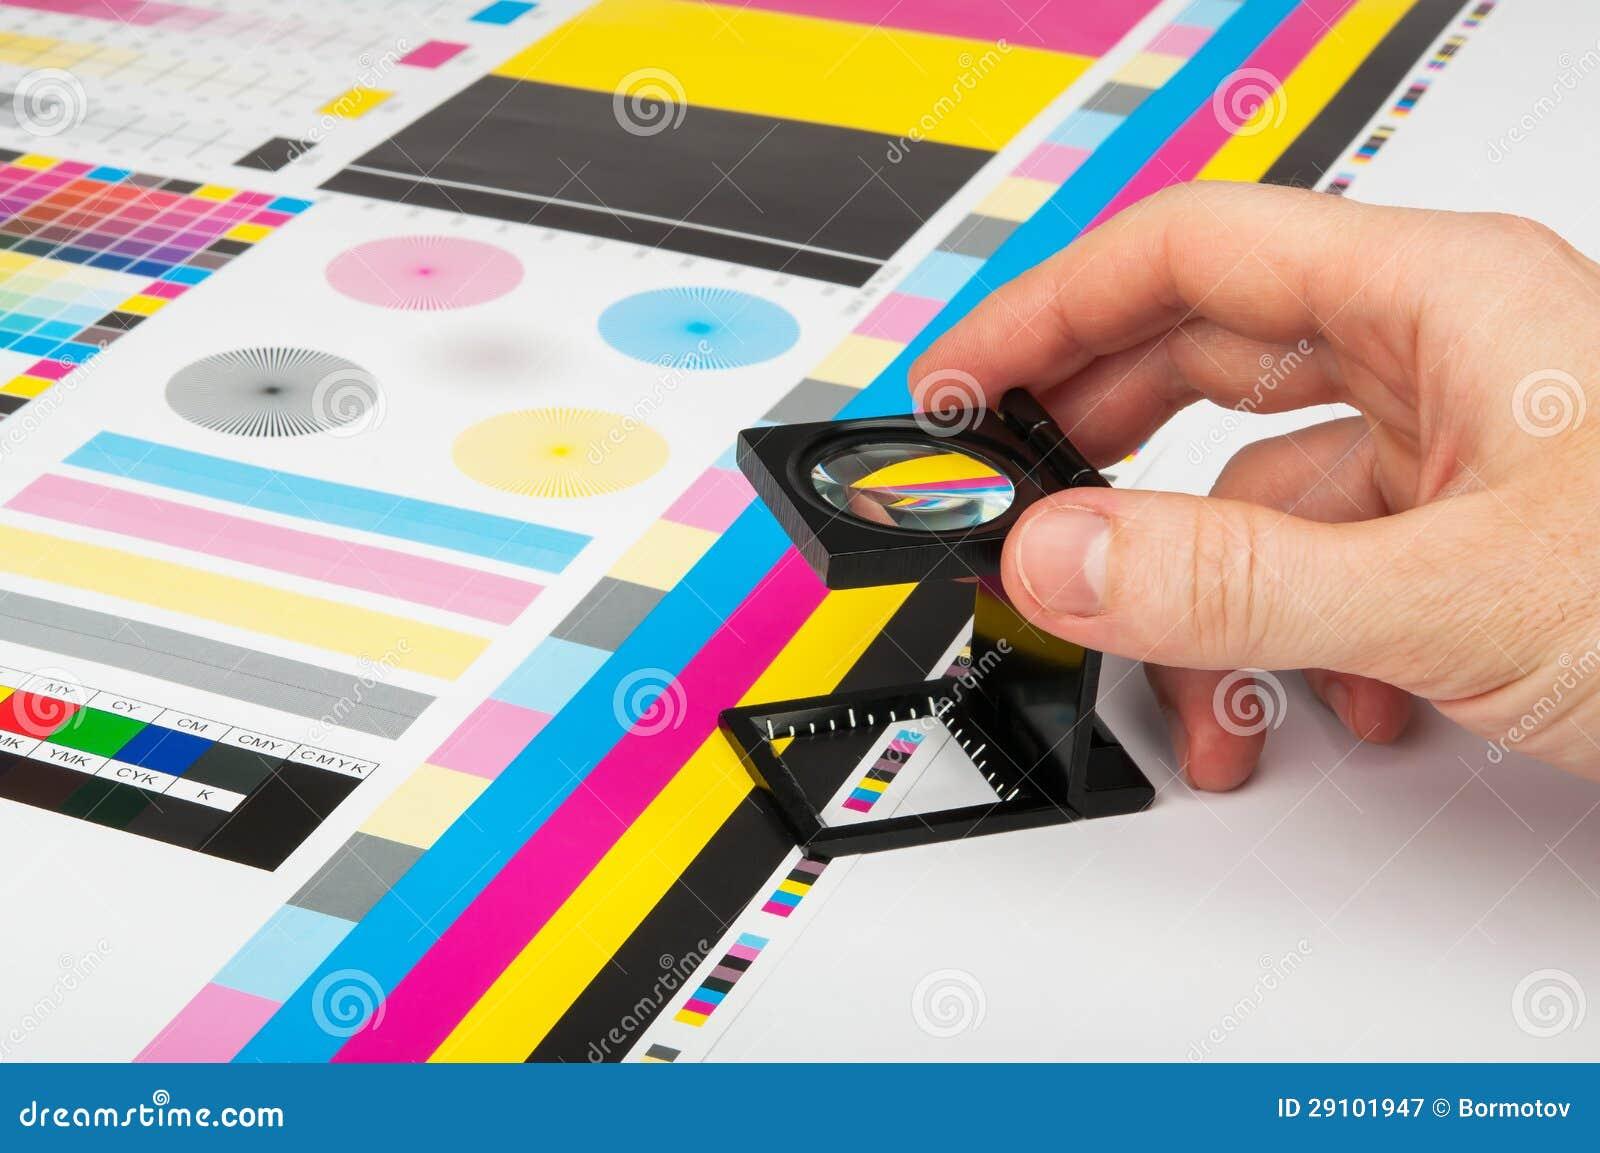 Prepress Color Management In Print Production